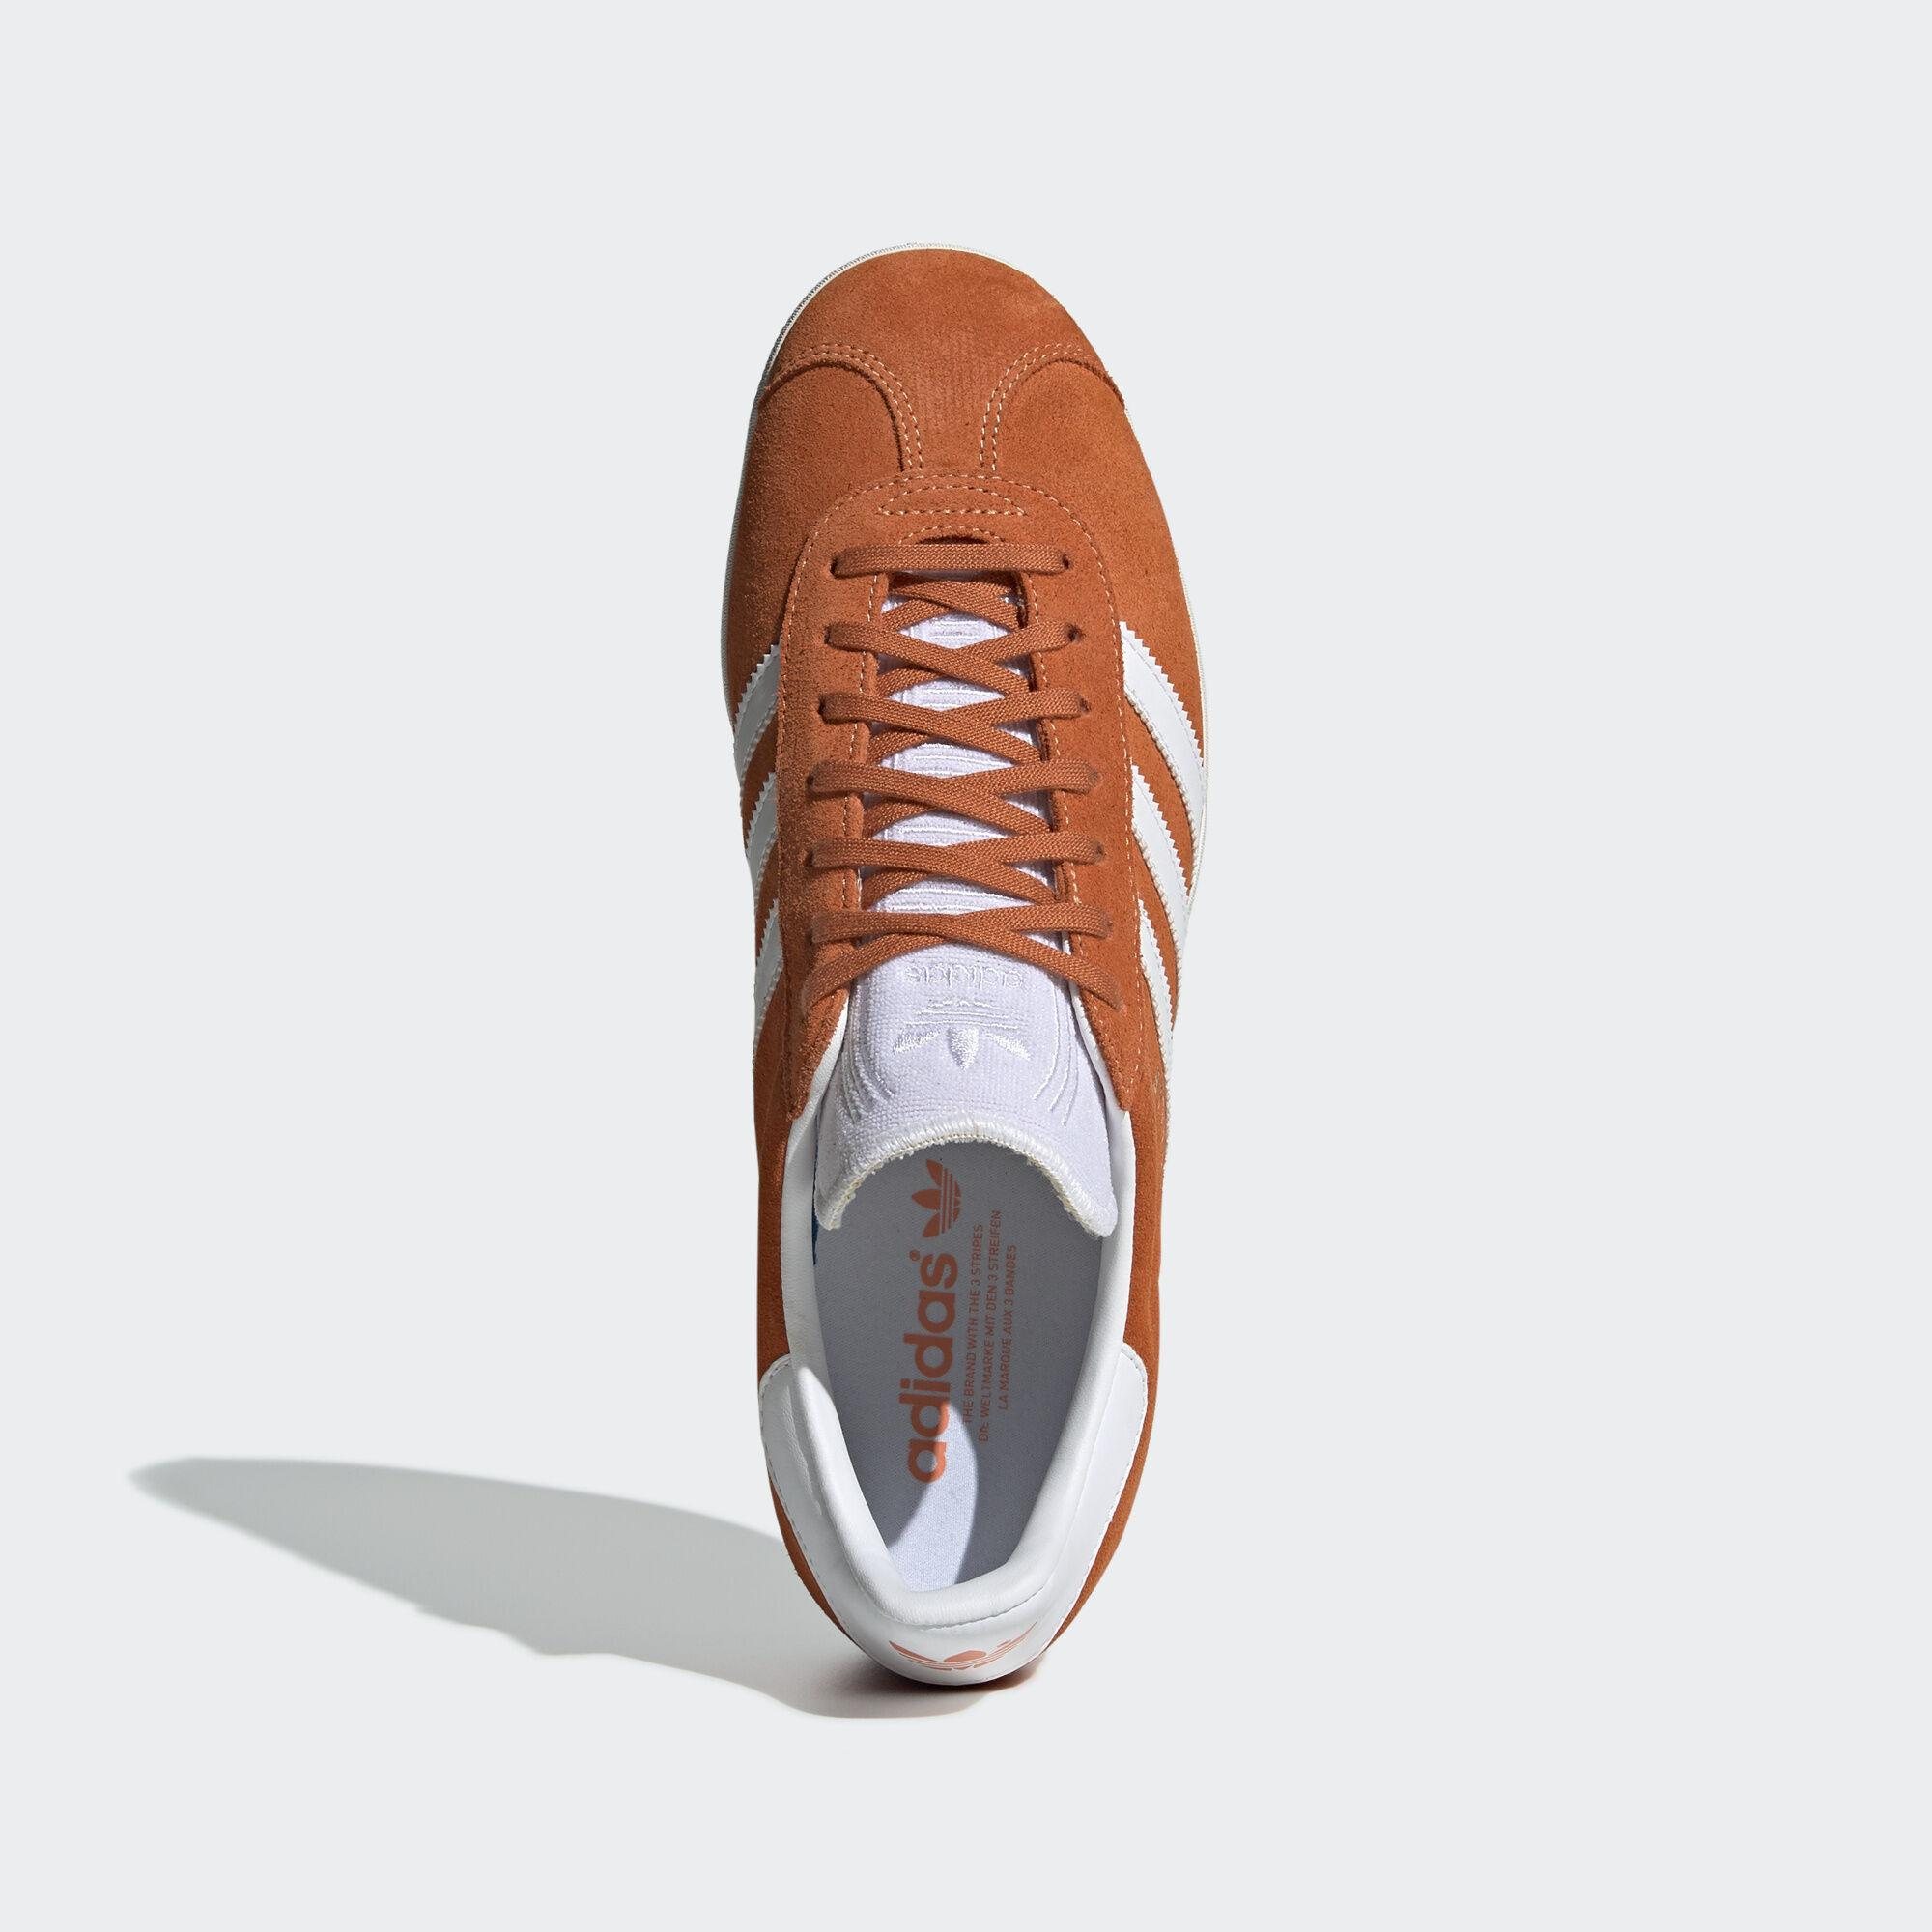 Adidas Gazelle Easy Orange/ Ftw White/ Crystal White adidas Originals de hombre